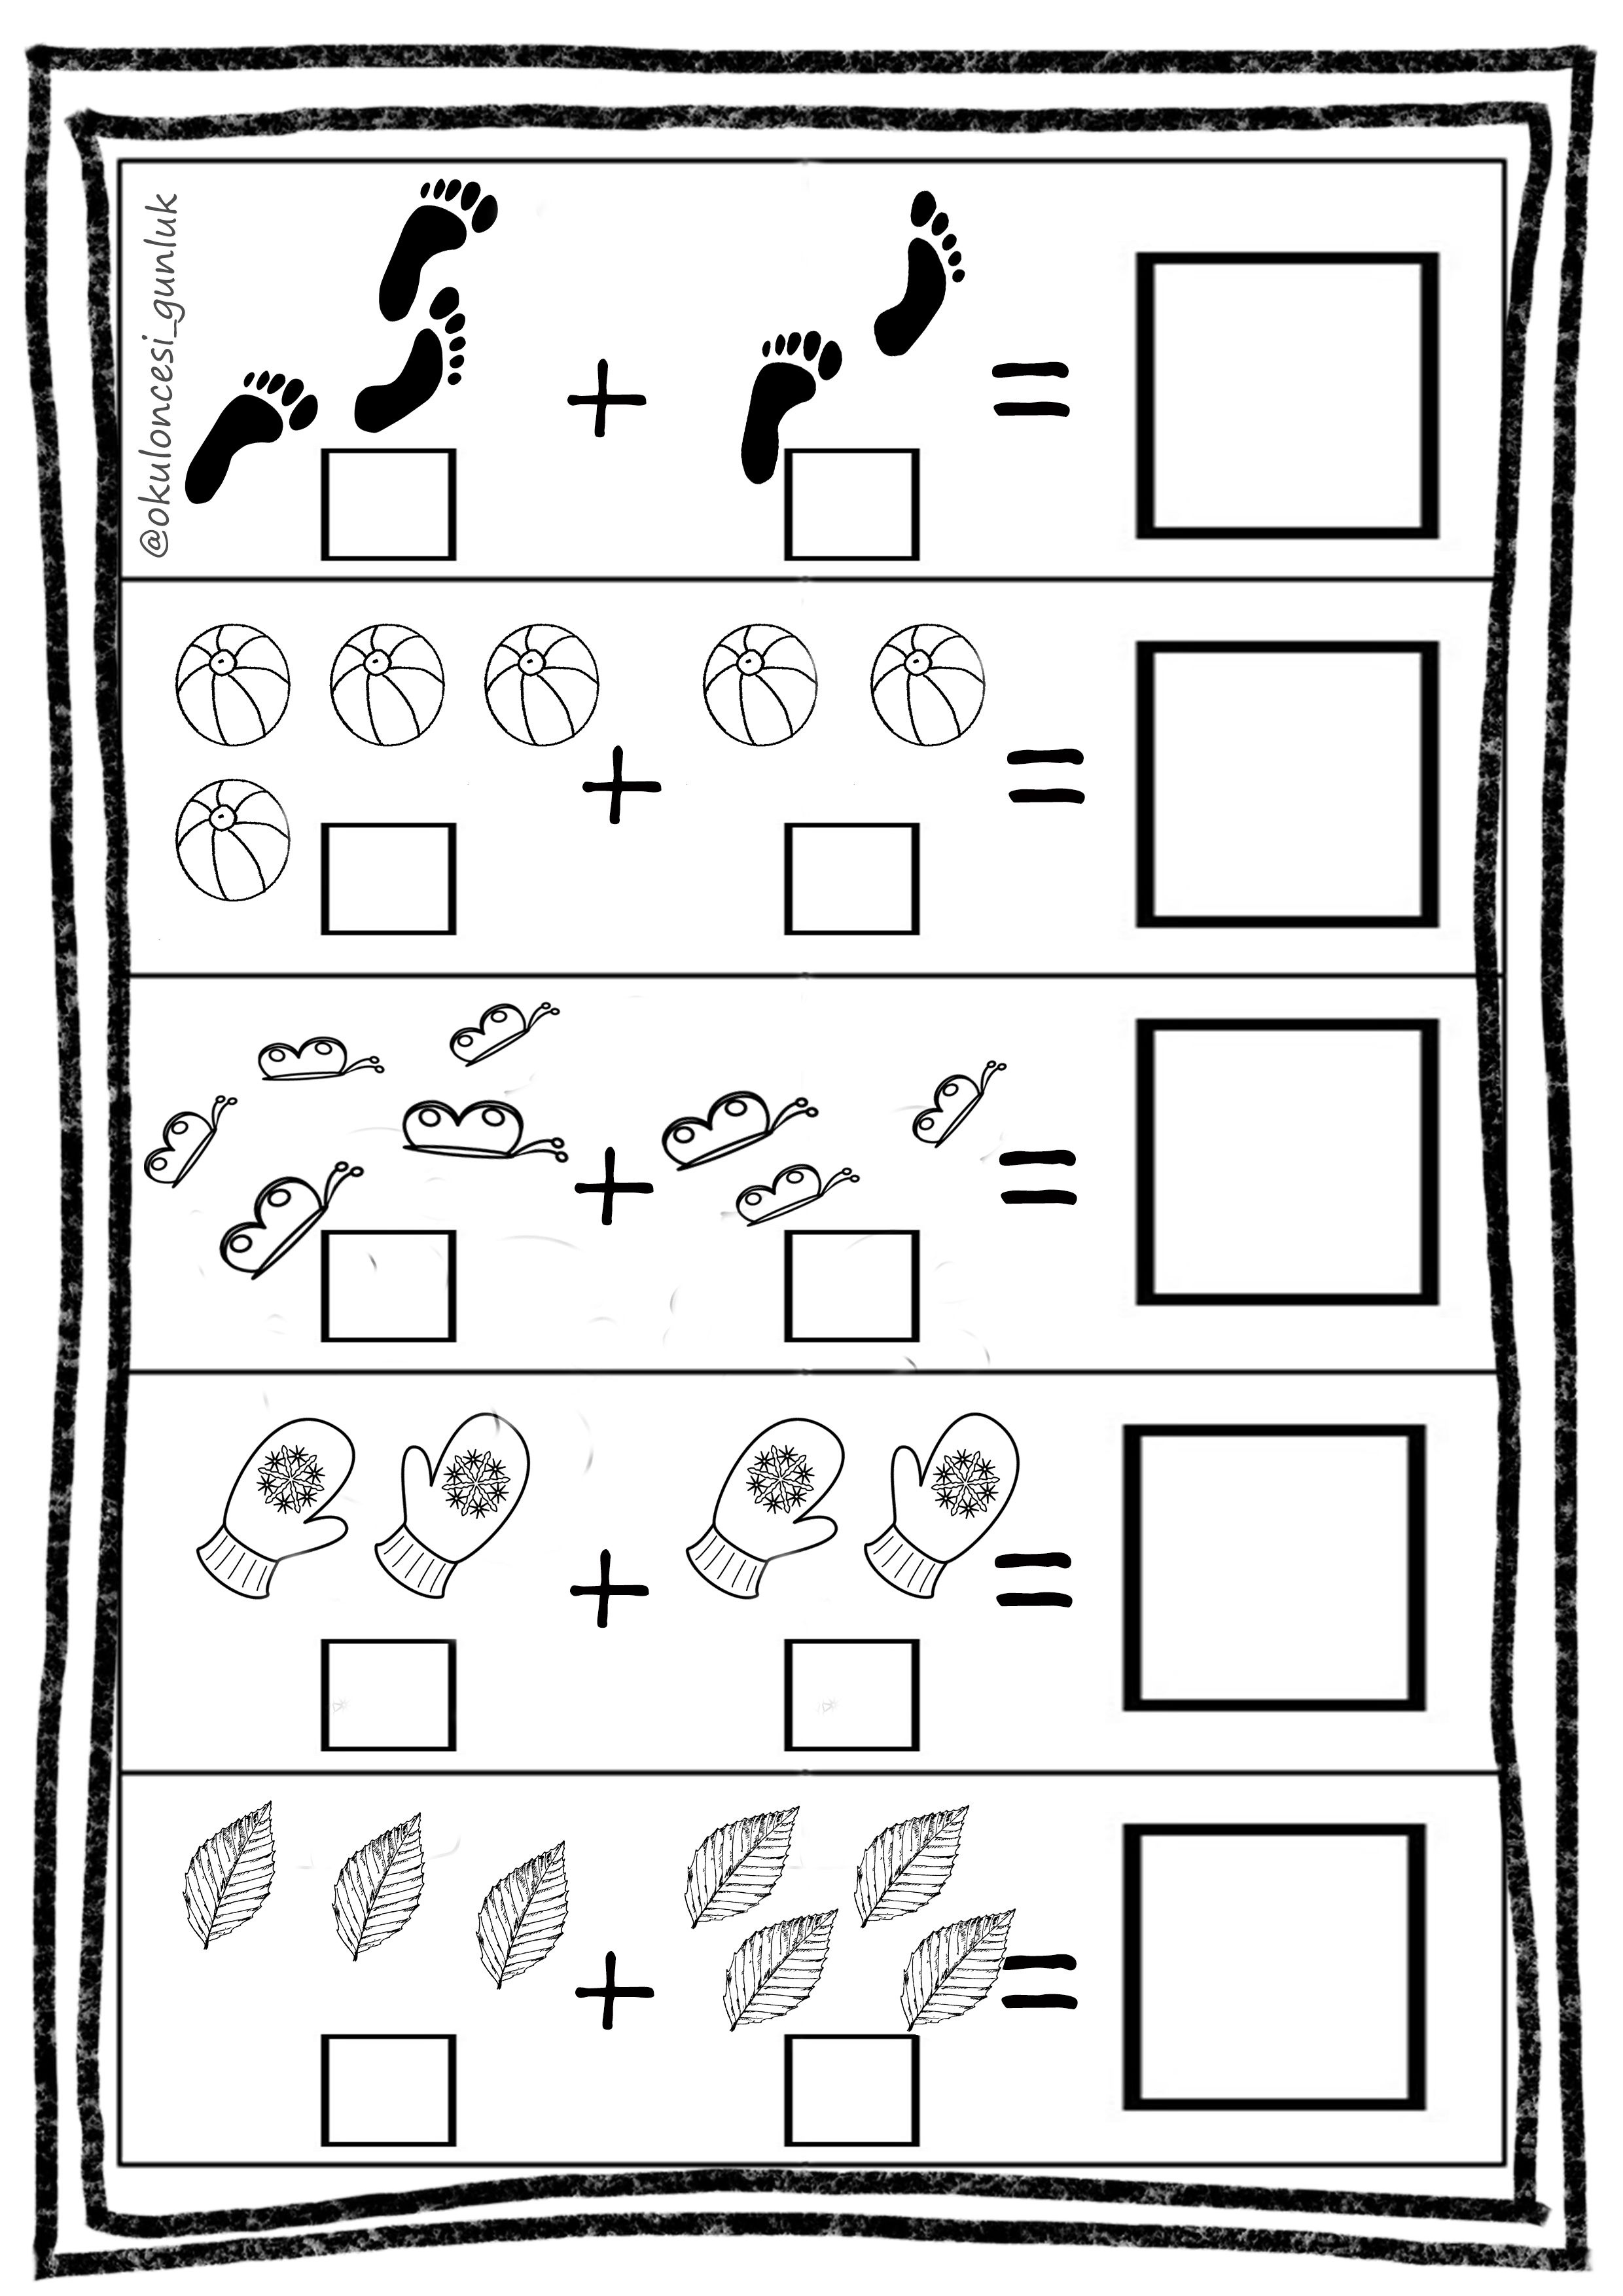 Pin By Mia On Calisma Sayfalari Workpages Math Centers Kindergarten Kindergarten Math Worksheets Kindergarten Addition Worksheets [ 3508 x 2480 Pixel ]